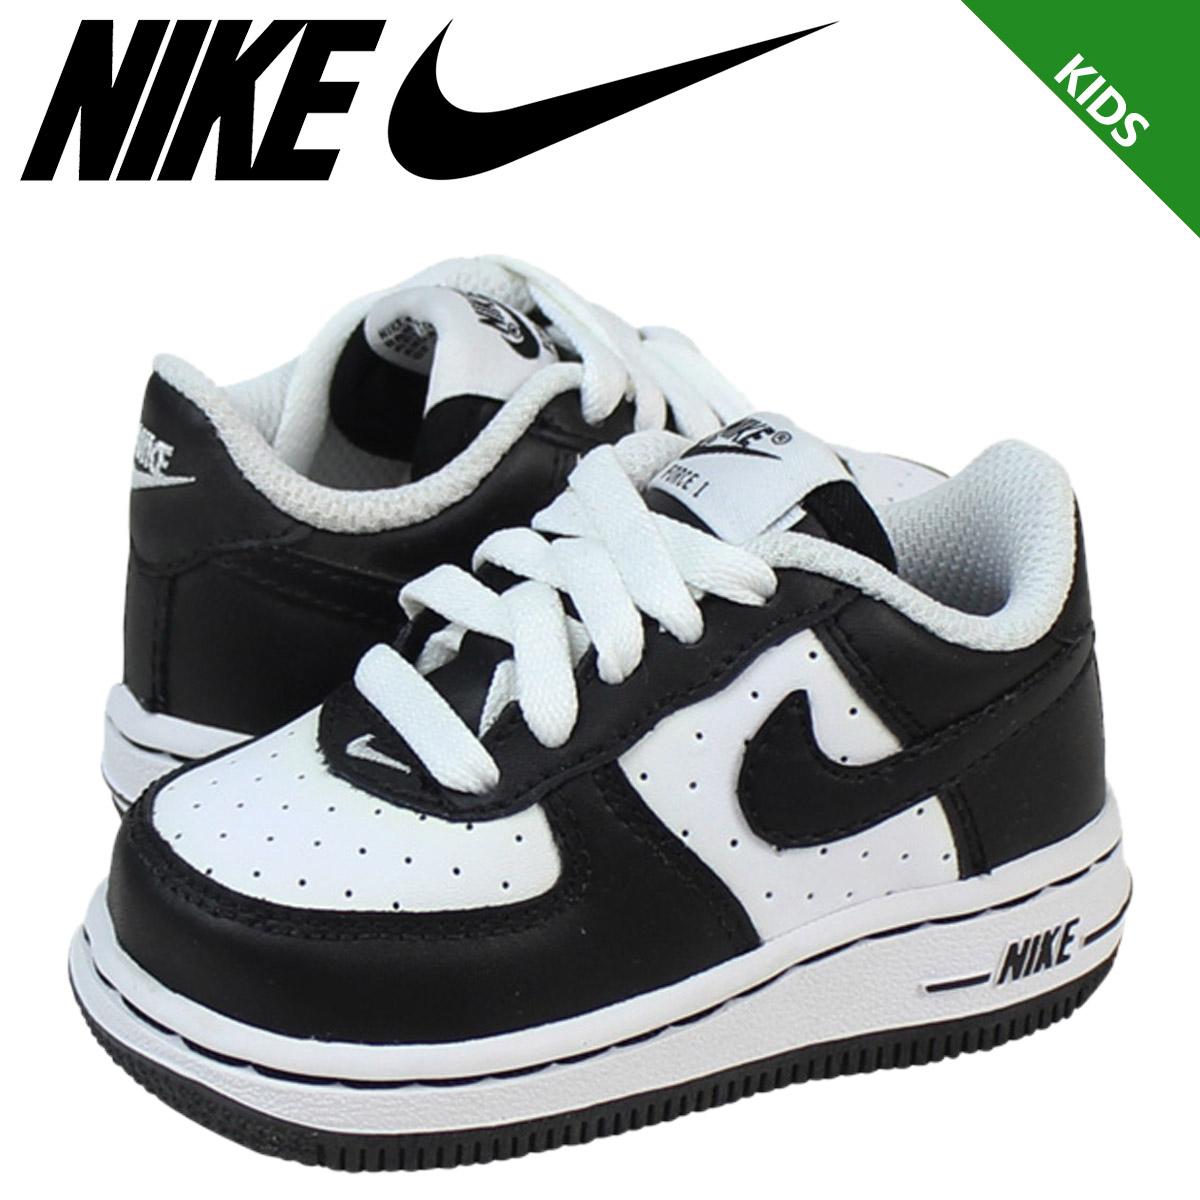 Whats up Sports   Rakuten Global Market: NIKE Nike Air Force ...